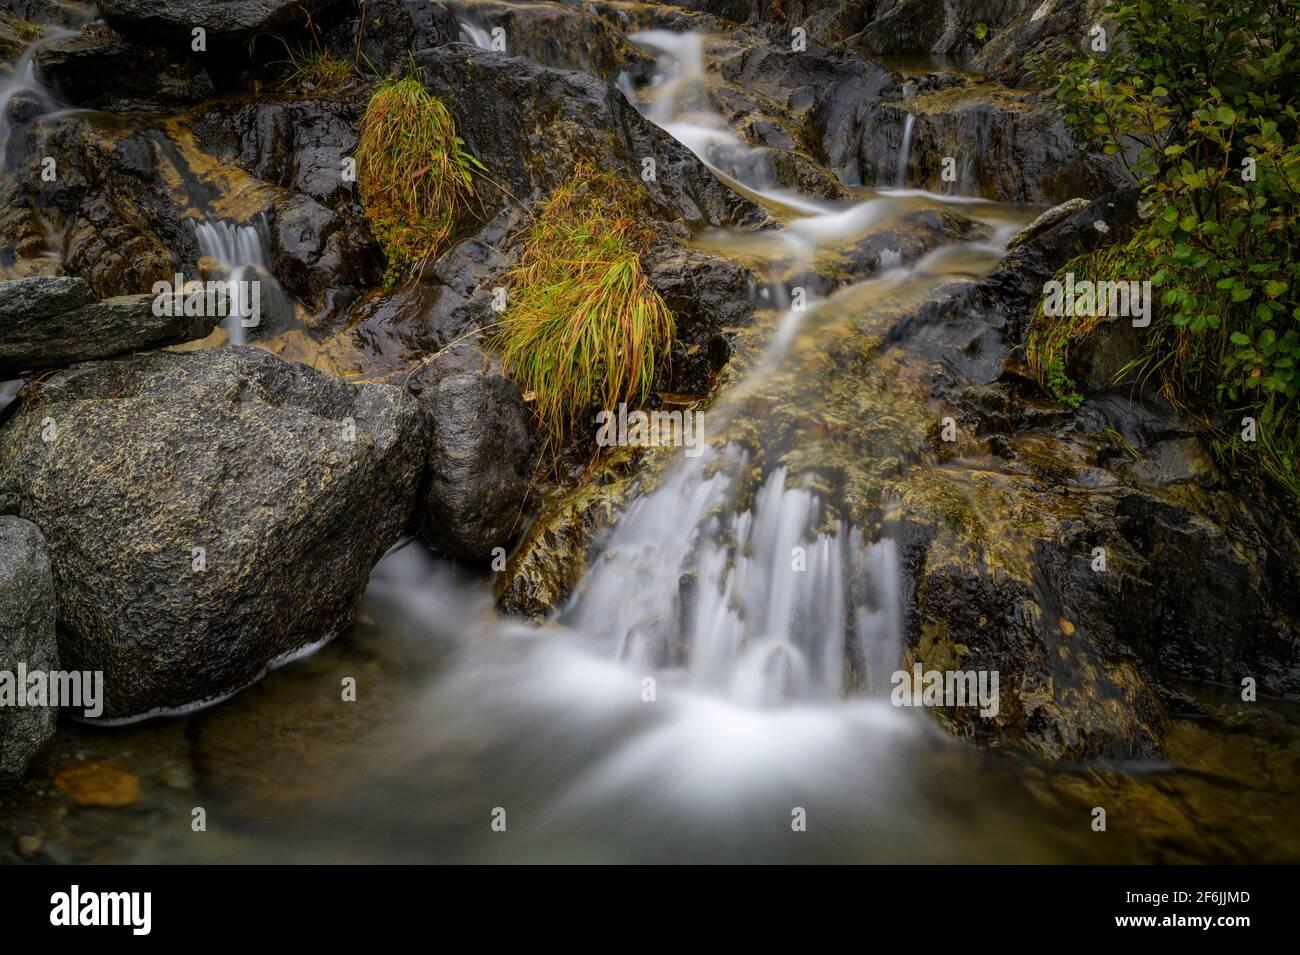 Small waterfall in mountain creek, Oberalppass, Switzerland Stock Photo